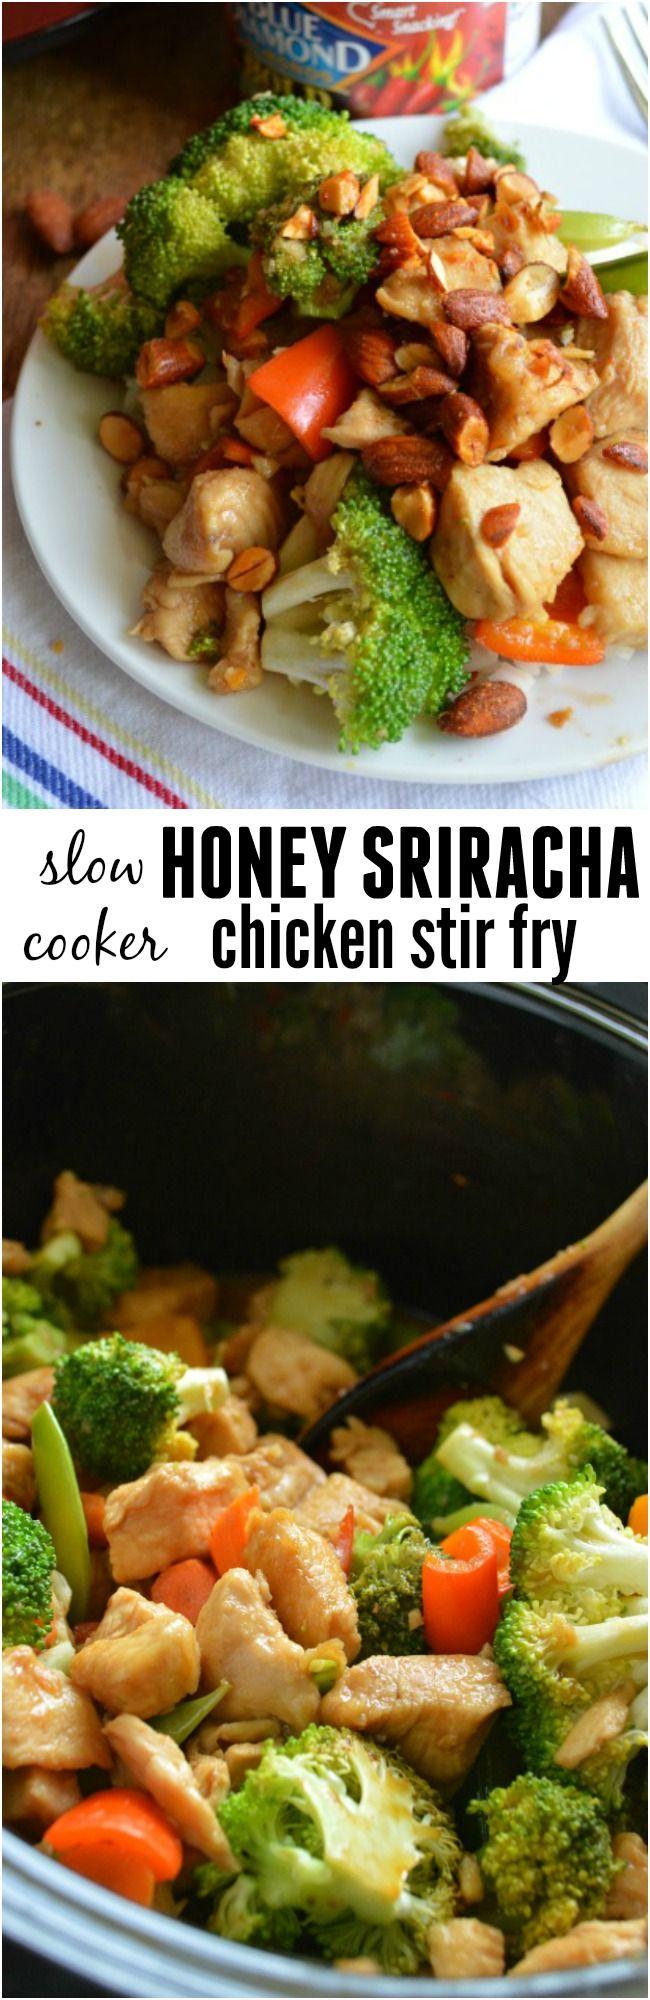 Slow Cooker Honey Sriracha Chicken Stir Fry - Sugar Dish Me